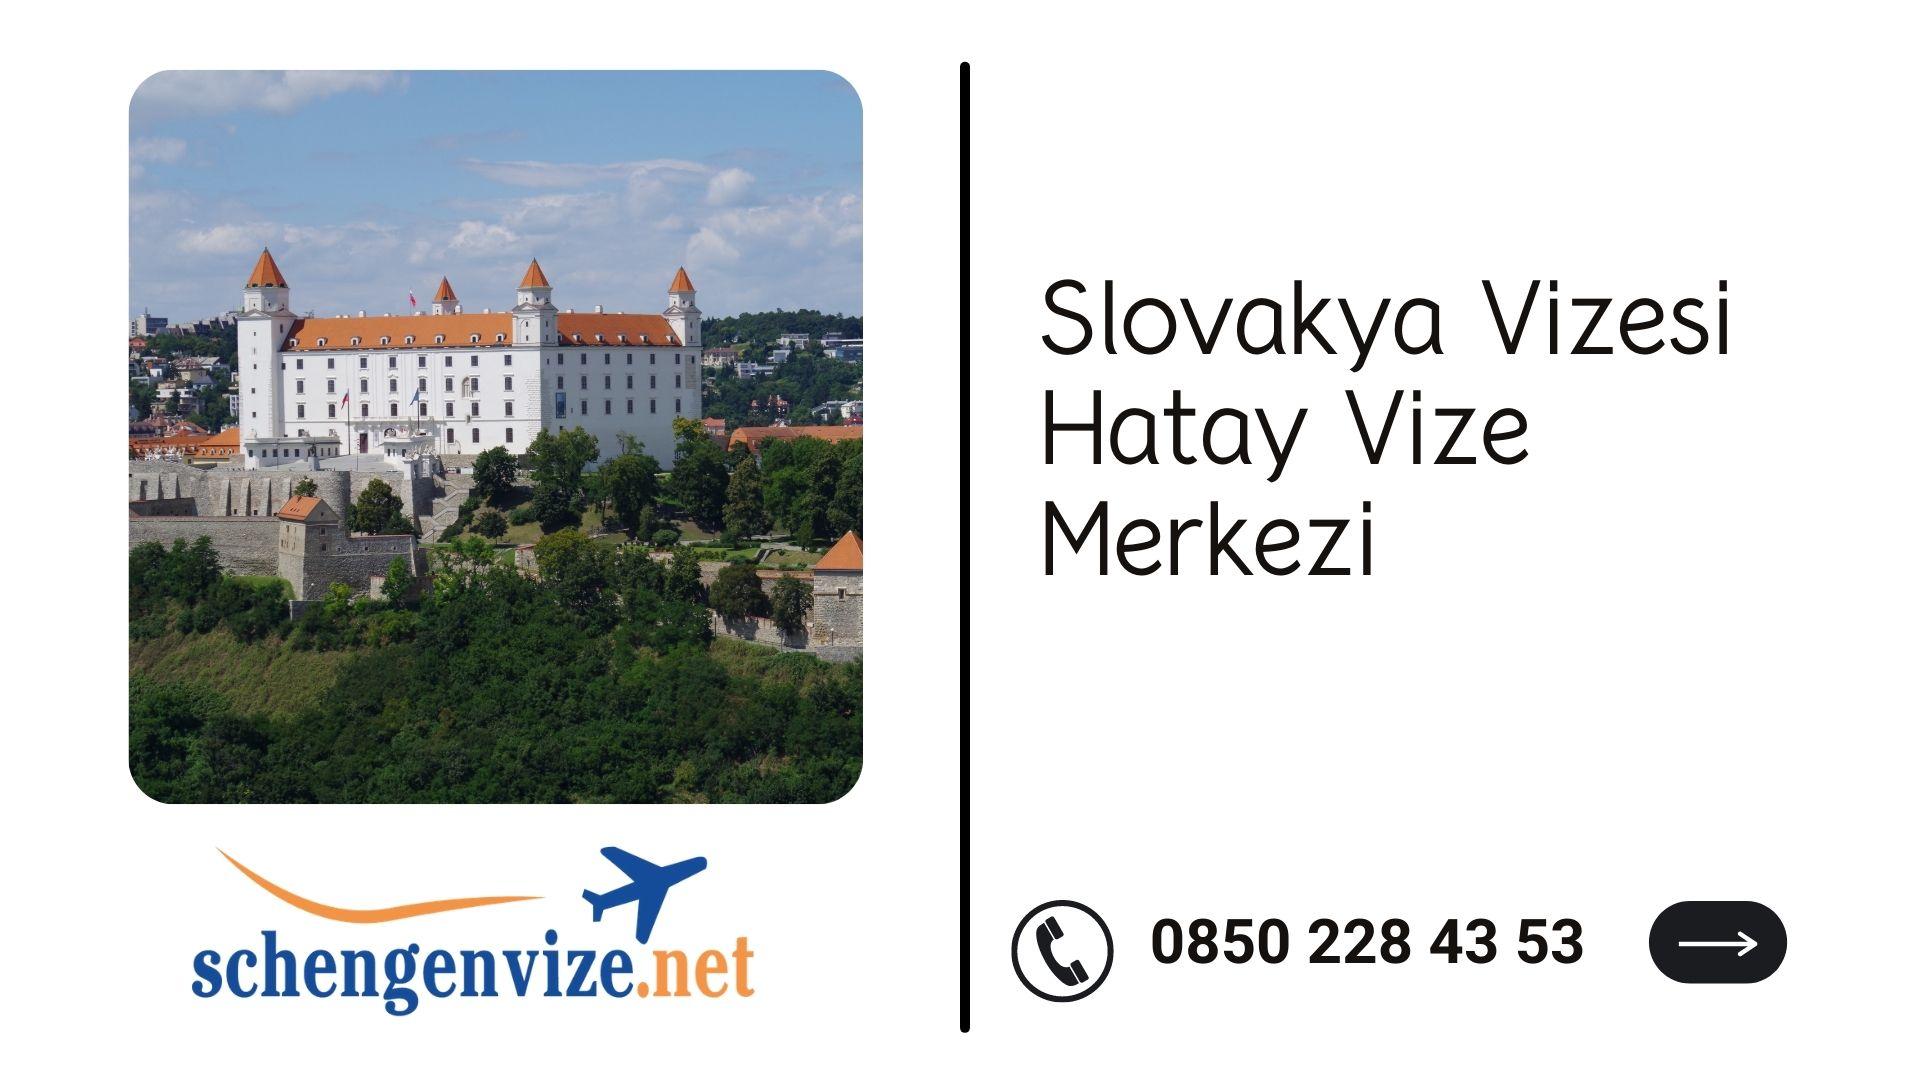 Slovakya Vizesi Hatay Vize Merkezi